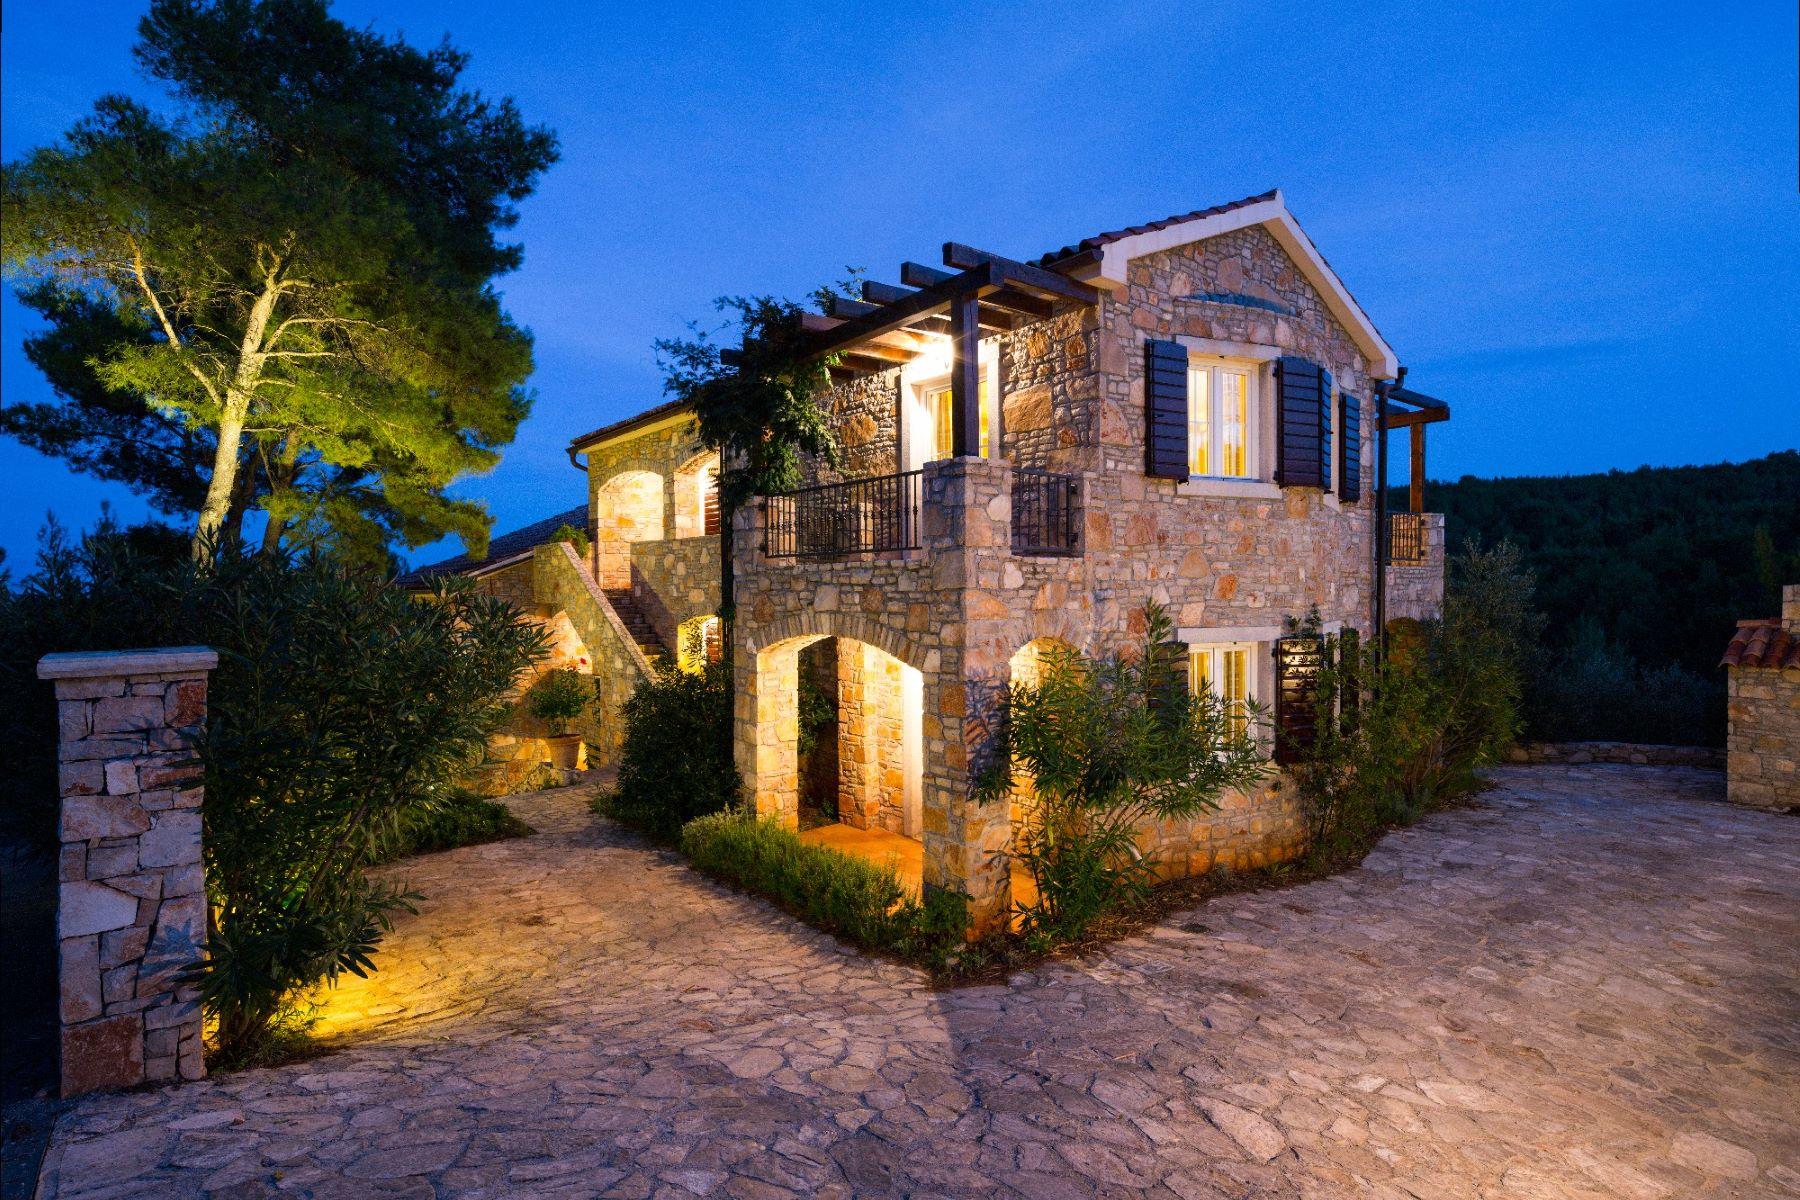 Maison unifamiliale pour l Vente à Villa Rustica Other Split Dalmatia, Split Dalmatia, 21463 Croatia